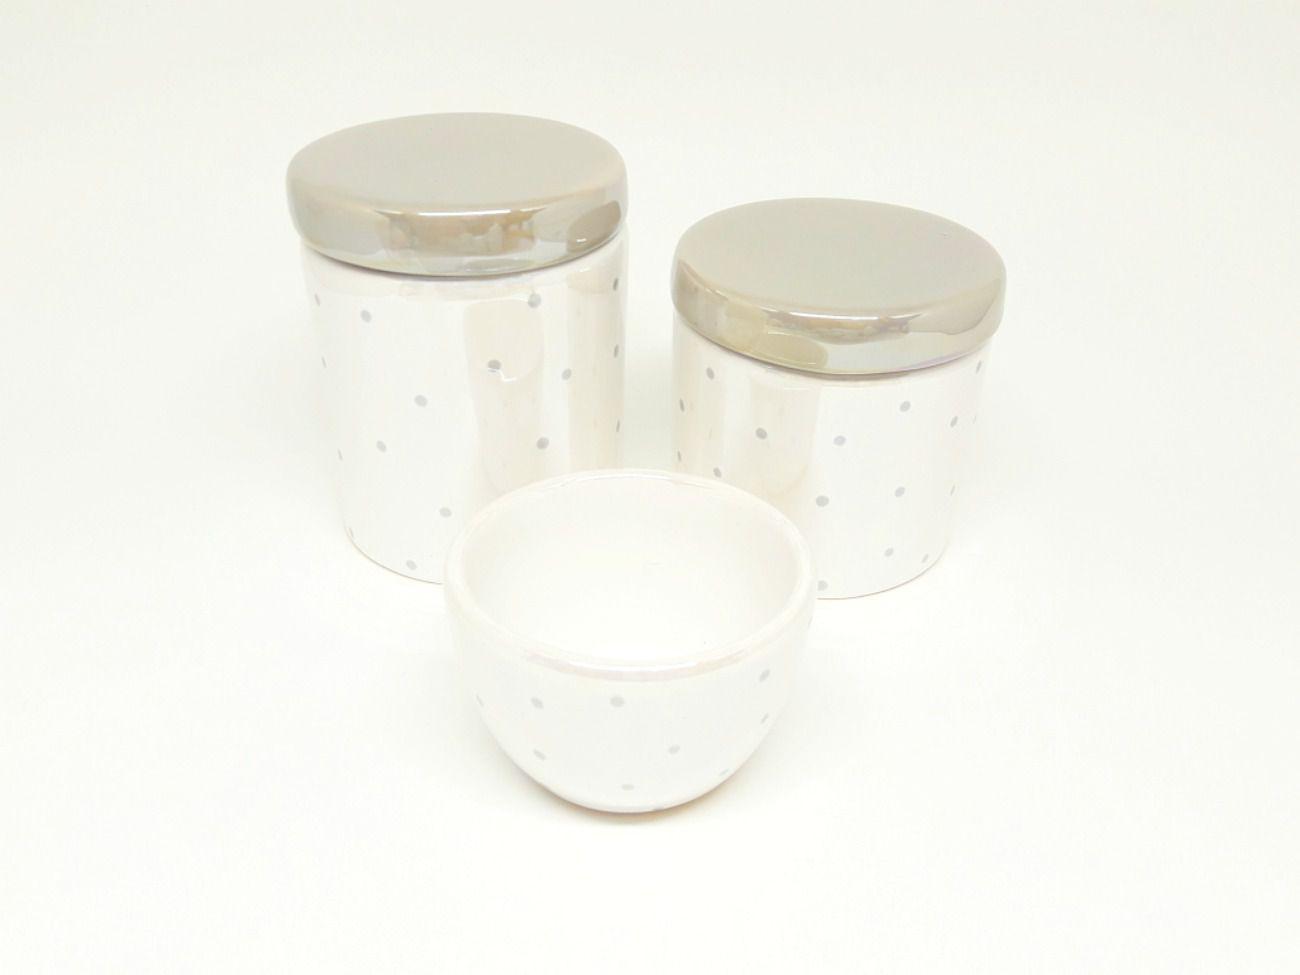 Kit Higiene Bebê Cerâmica Perolizado / Perolado Cinza & Poá Cinza | 3 peças